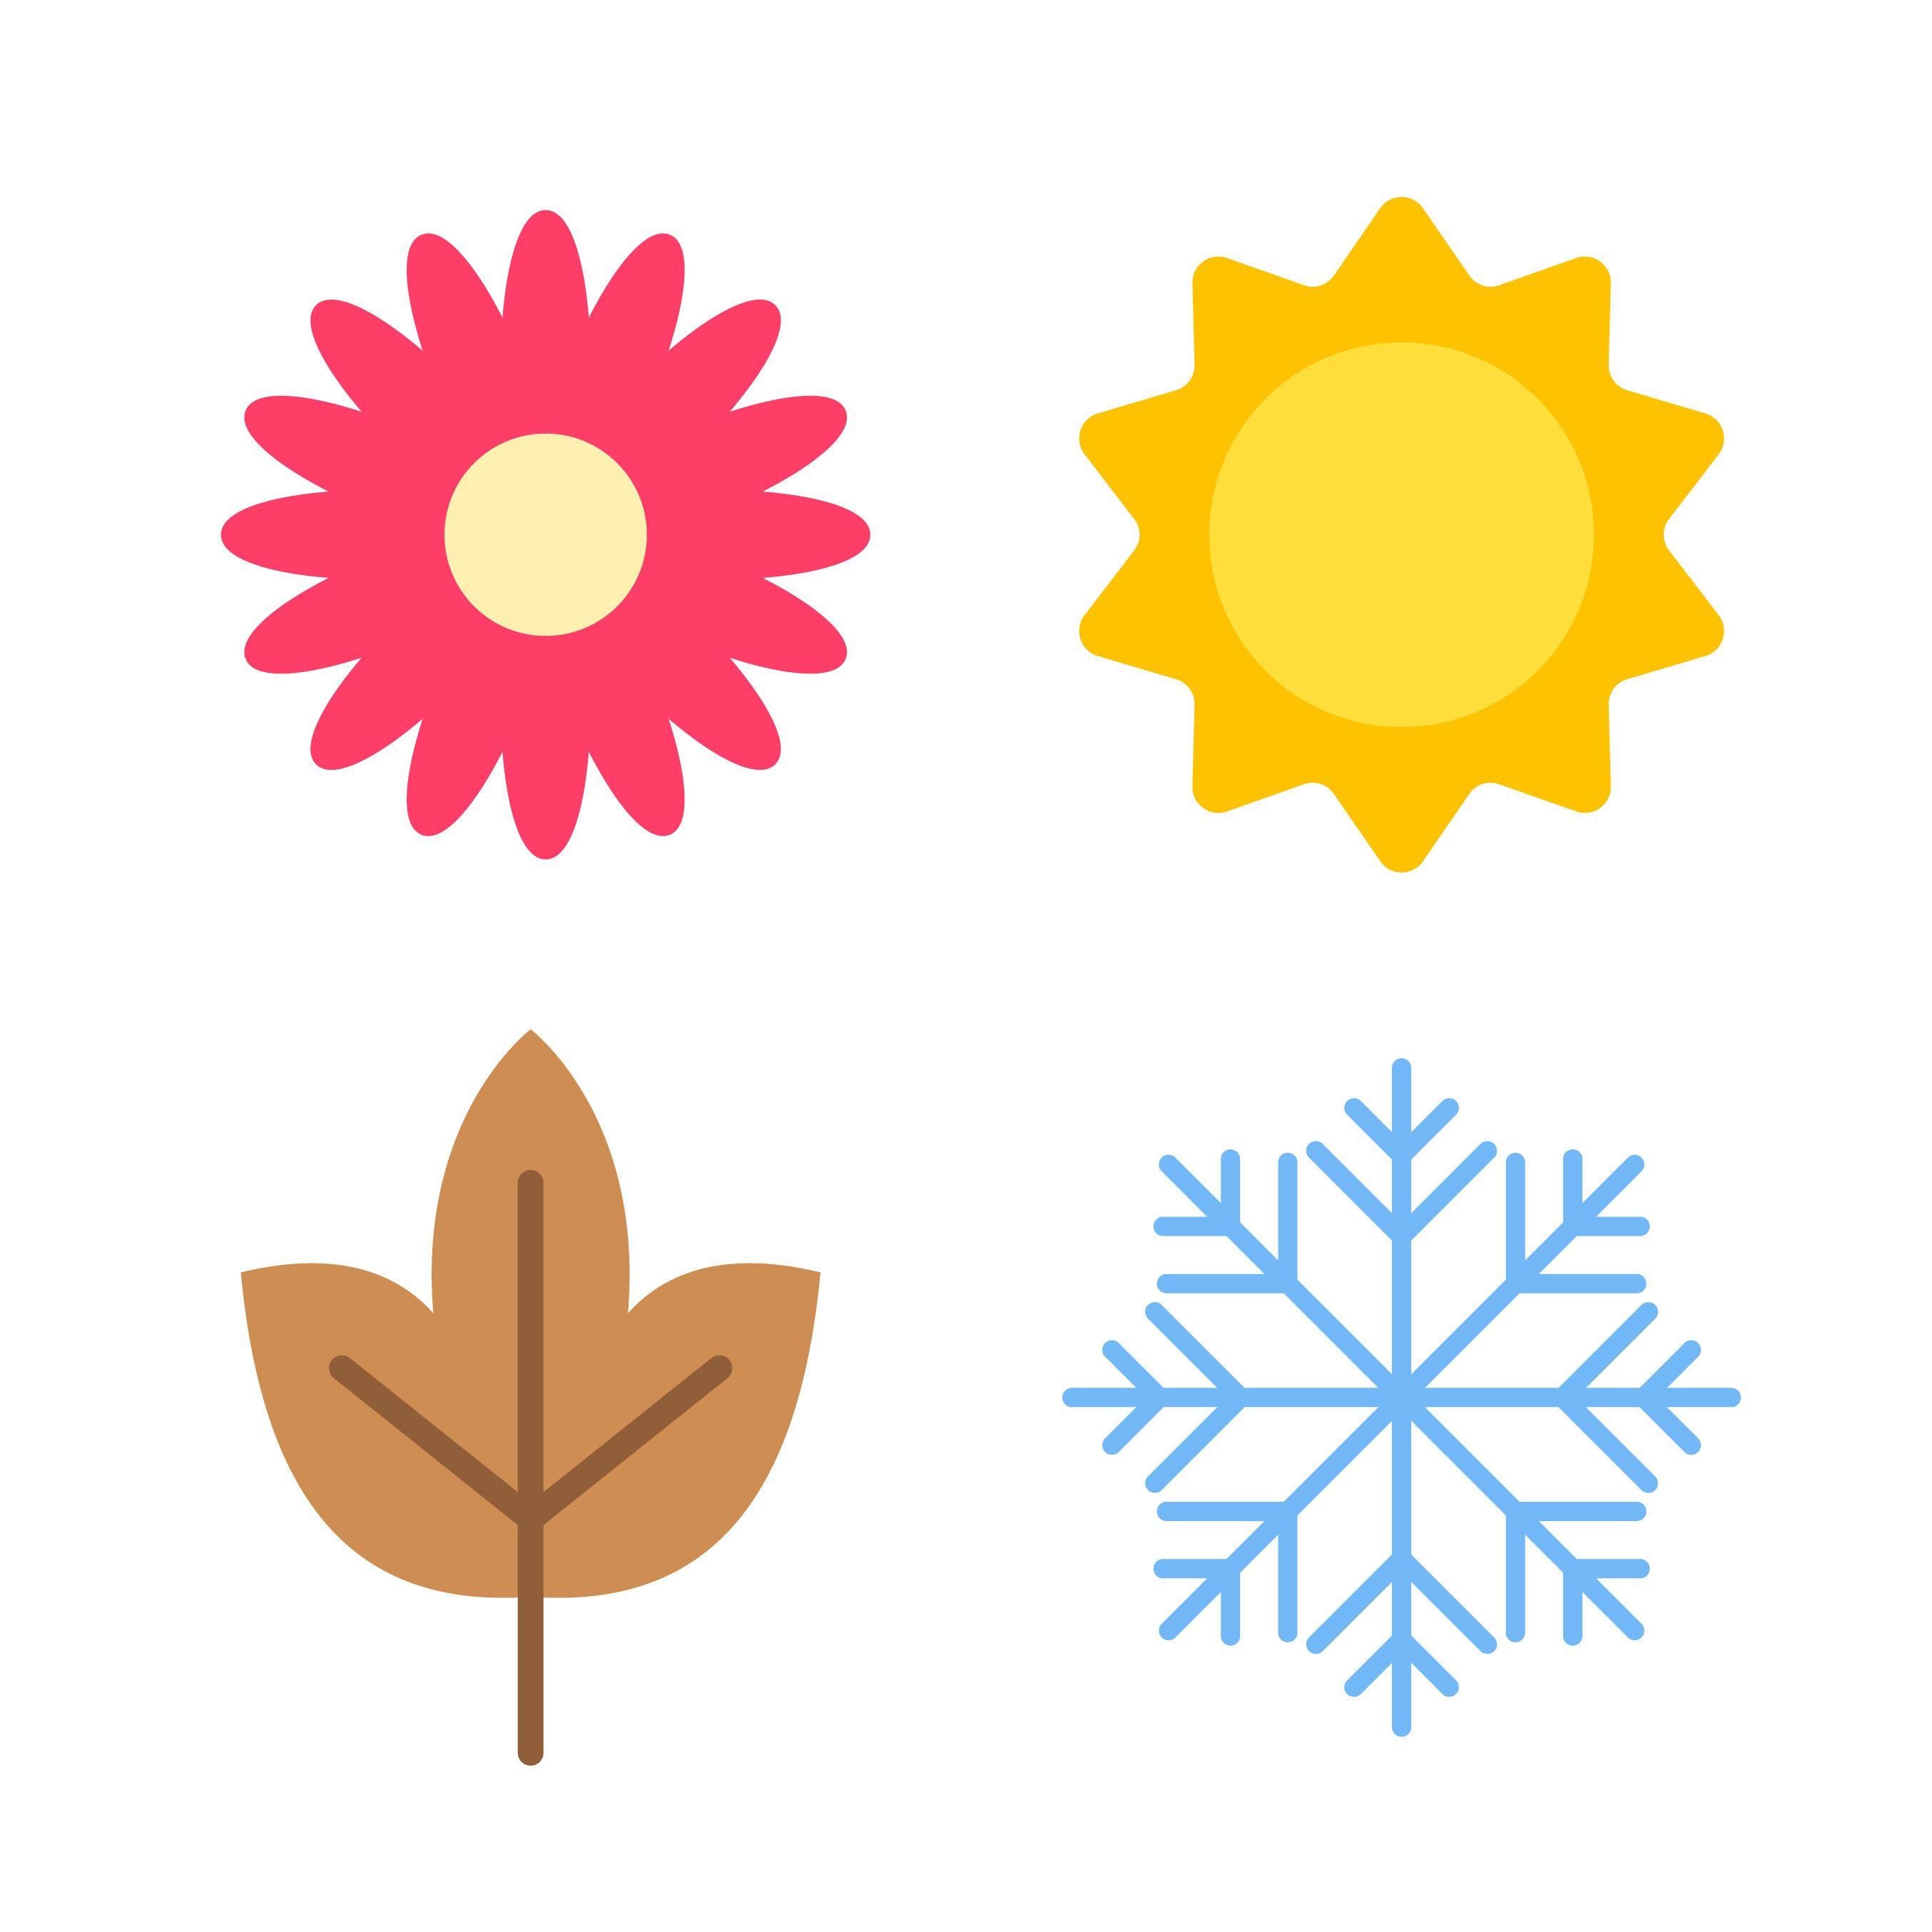 Conjunto de iconos de temporada de dibujos animados